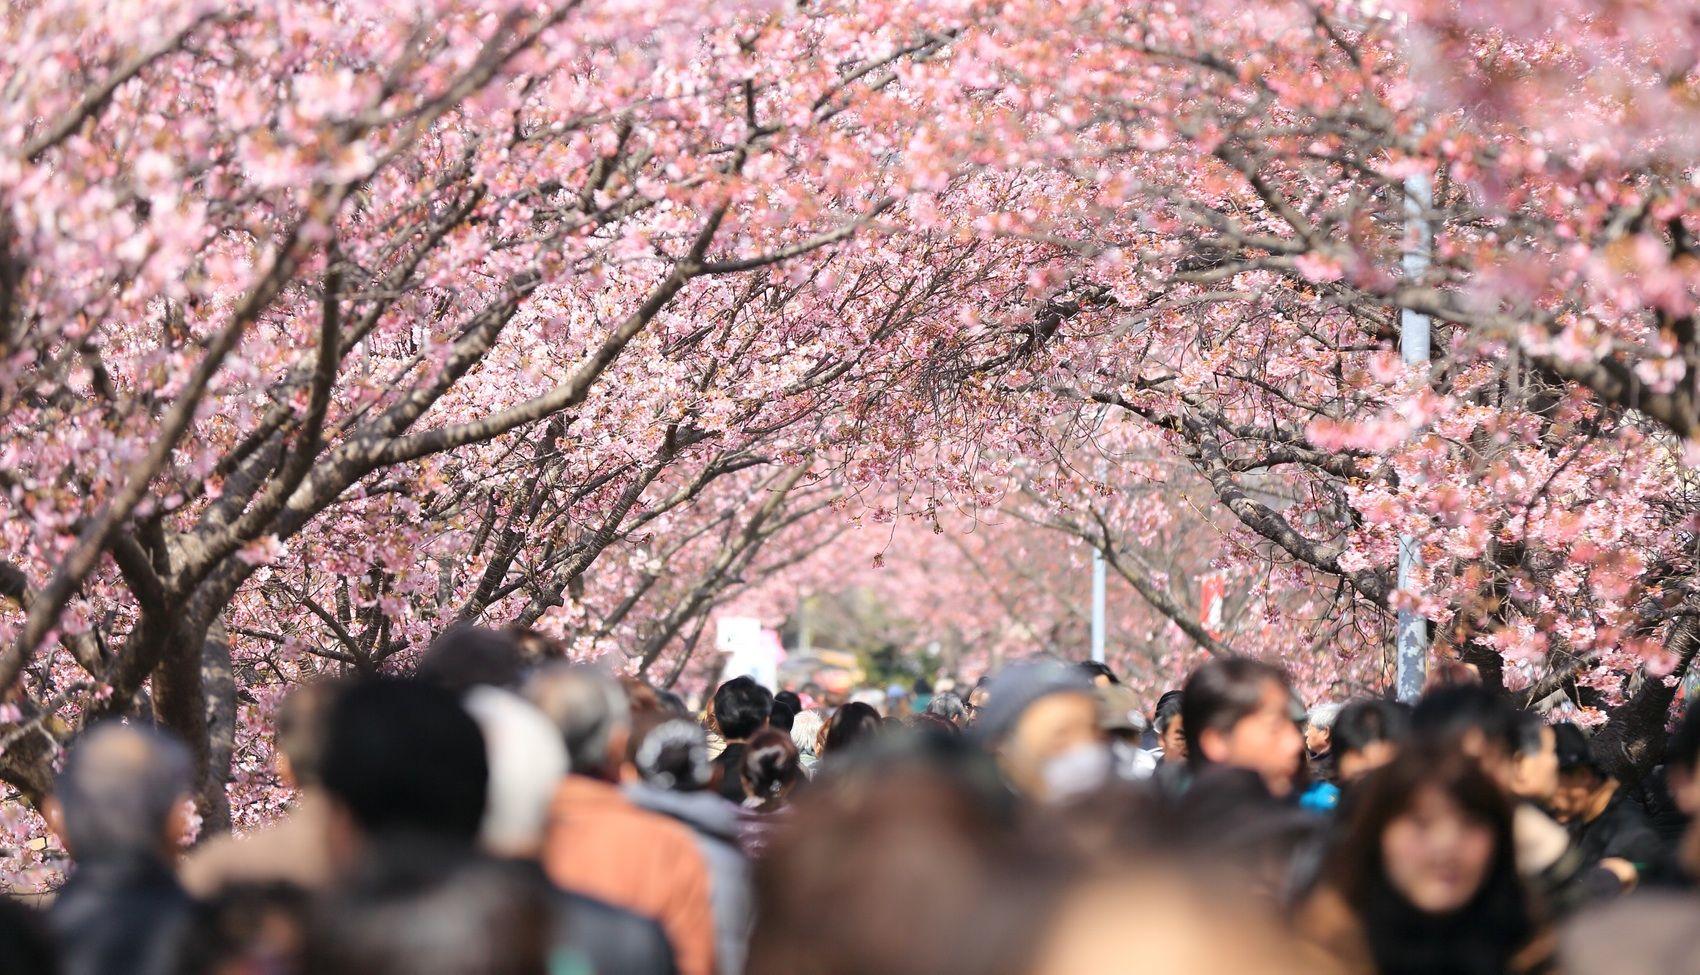 Photo By Kazuend Unsplash Cherry Blossom Symbolism Cherry Blossom Japan Cherry Blossom Meaning